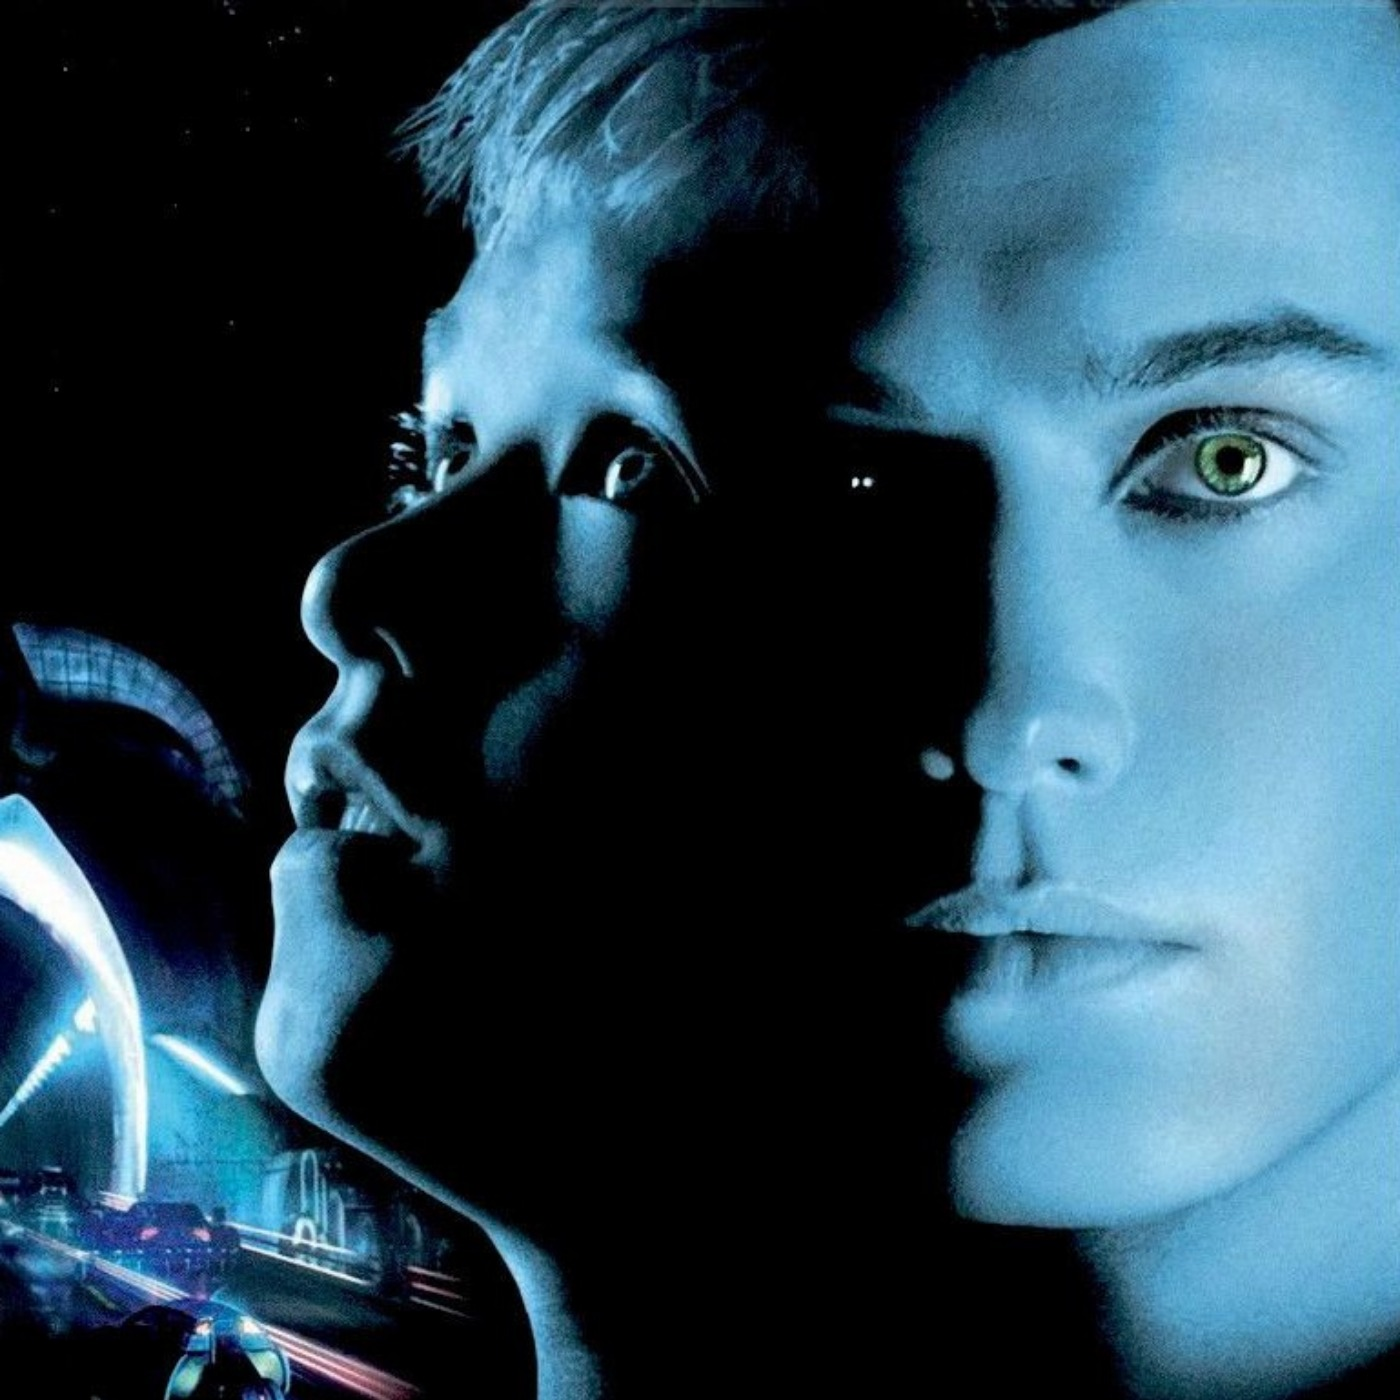 PODCAST CINEMA | Critique du film AI Intelligence Artificielle | MICRO FICTION | CinéMaRadio